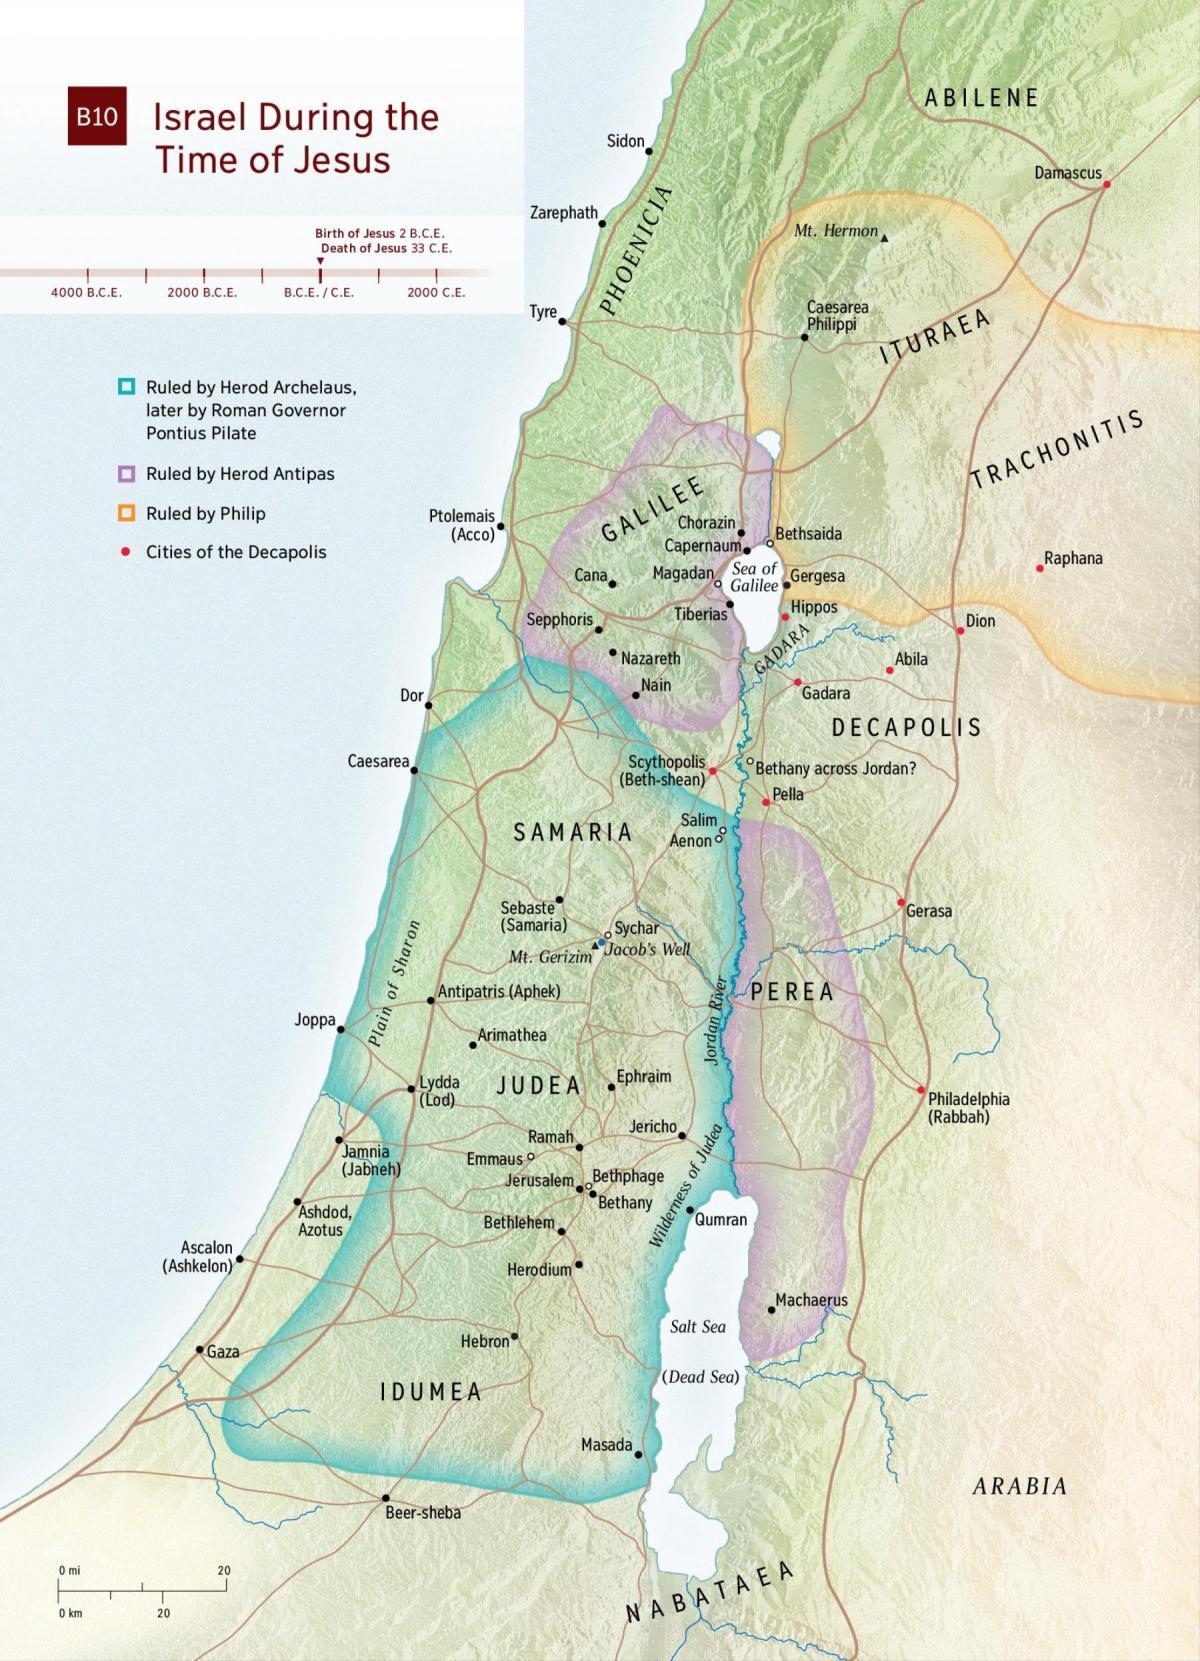 Carte de la terre Sainte au temps de Jésus - Carte de la terre ...